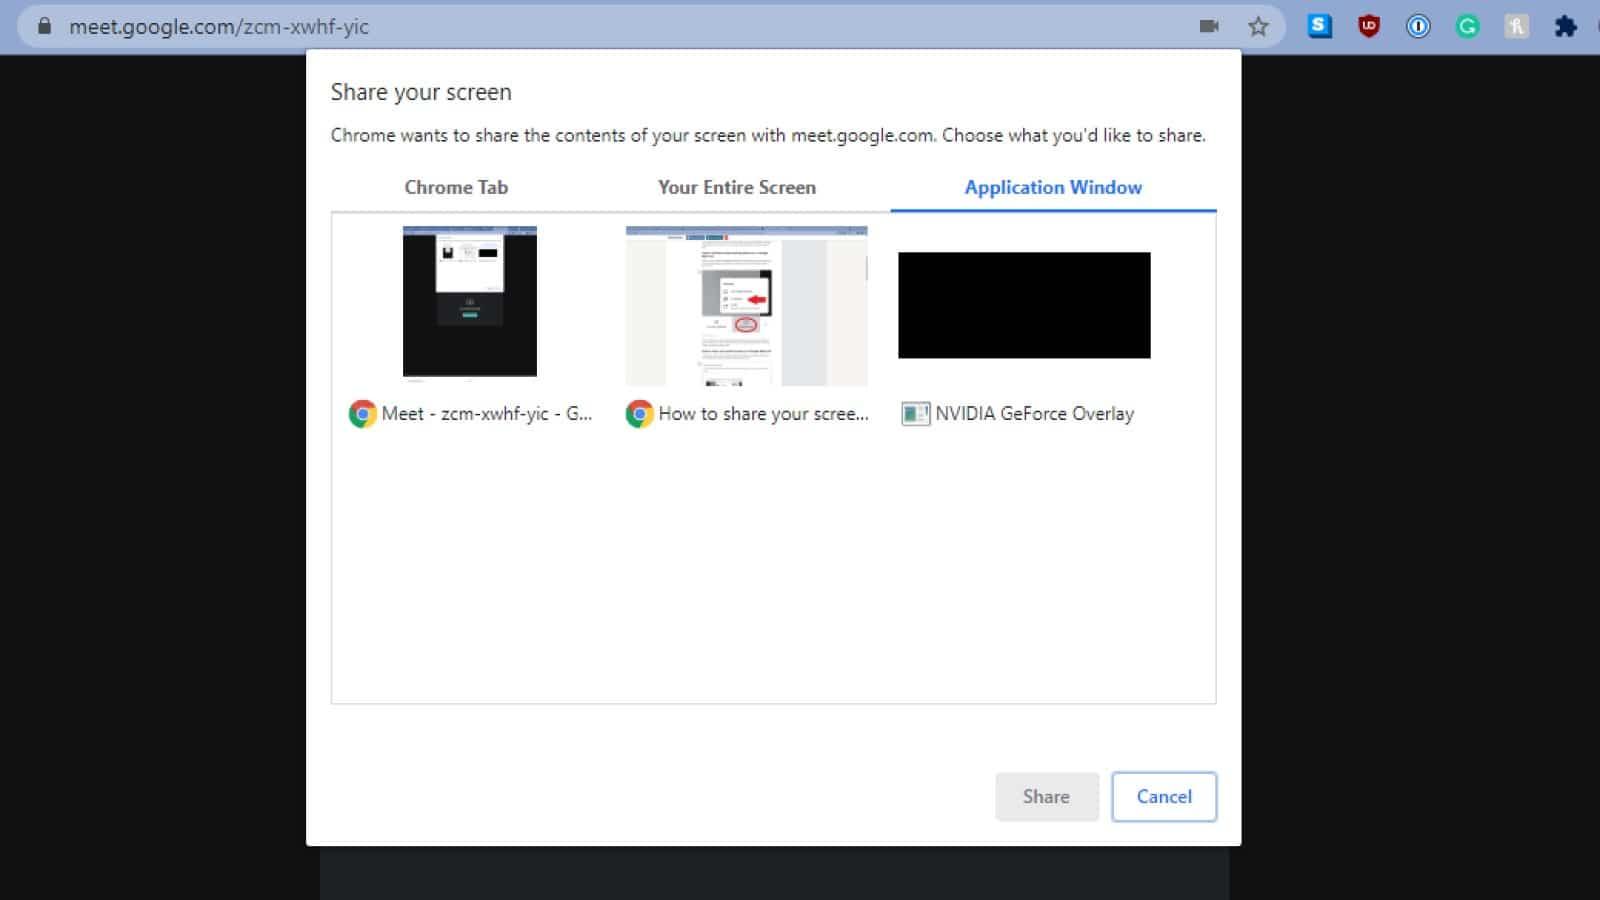 google meet screen sharing menu showing a choice between chrome tab, your entire screen, or application window